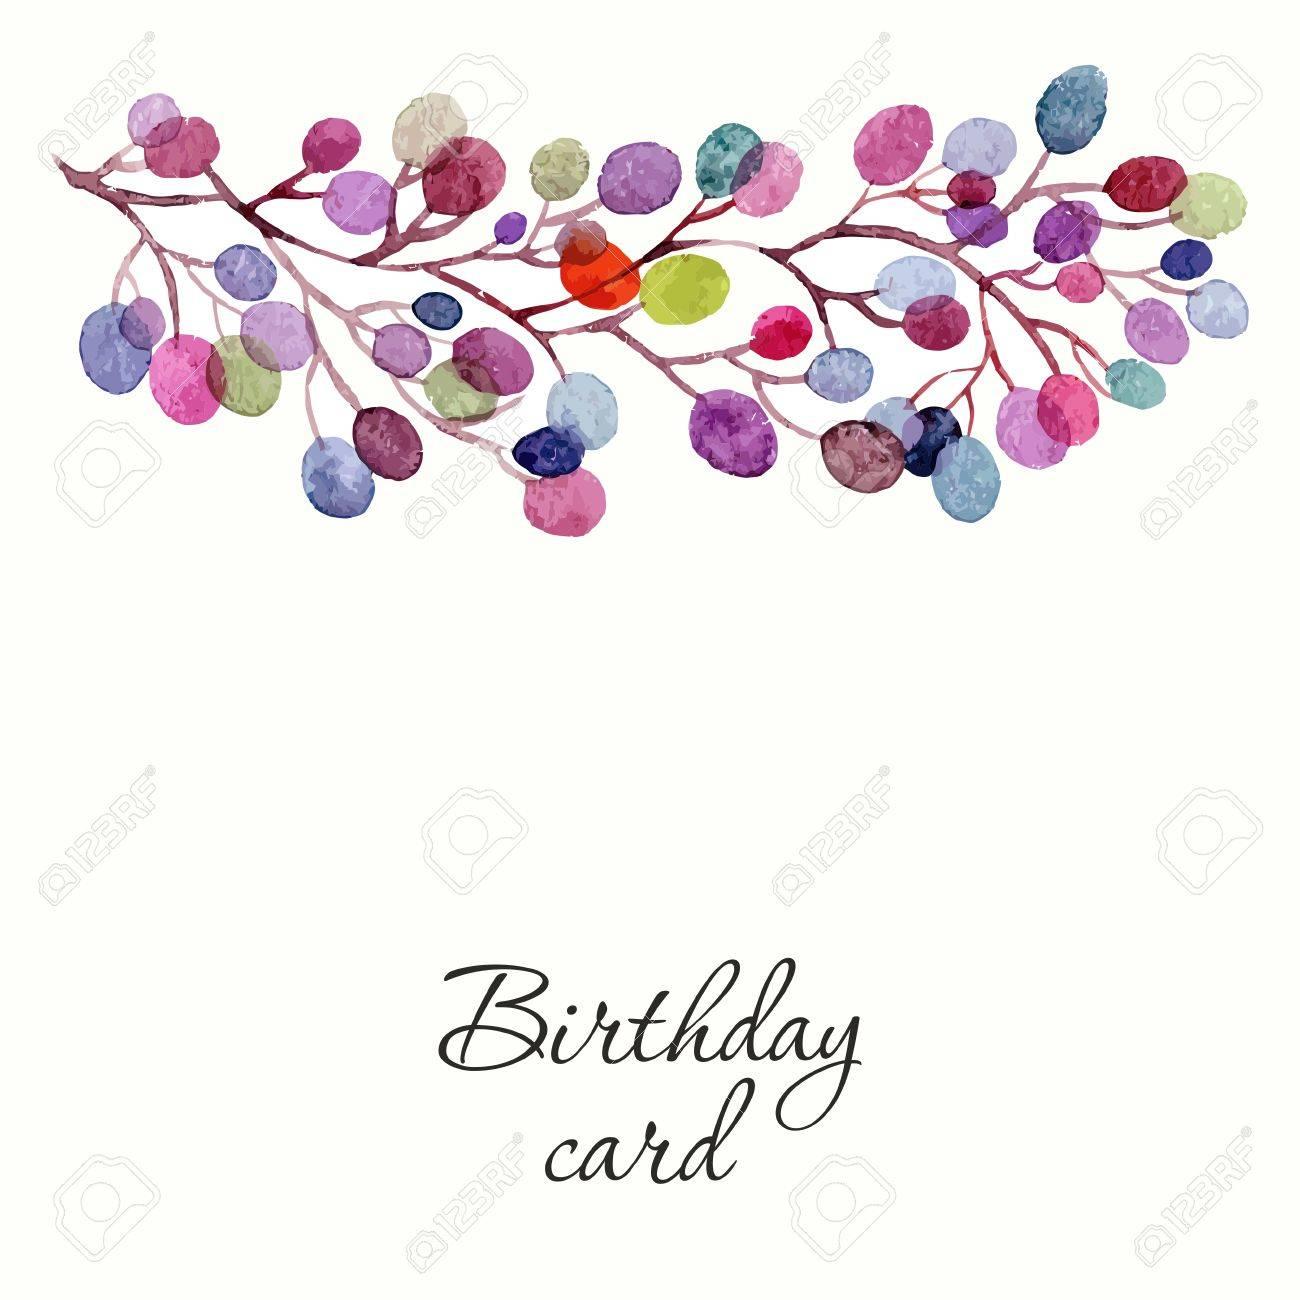 Invitation wedding or birthday card floral frame watercolor invitation wedding or birthday card floral frame watercolor background with flowers banco stopboris Images